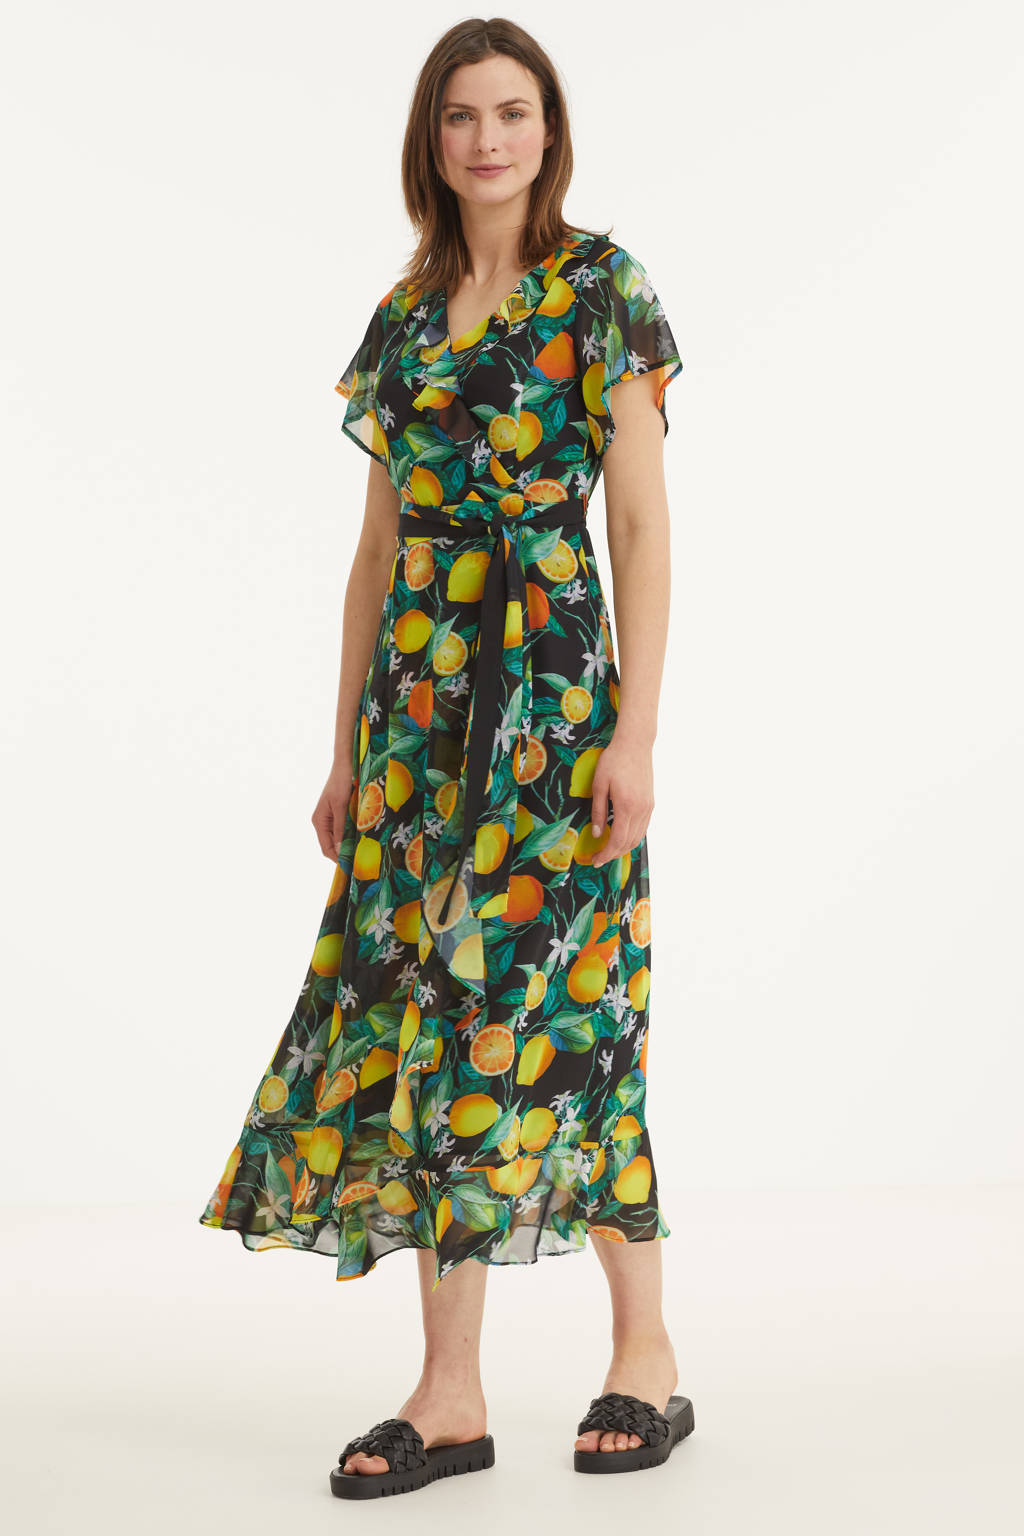 Smashed Lemon A-lijn jurk met all over print en ceintuur zwart/multi, Zwart/multi